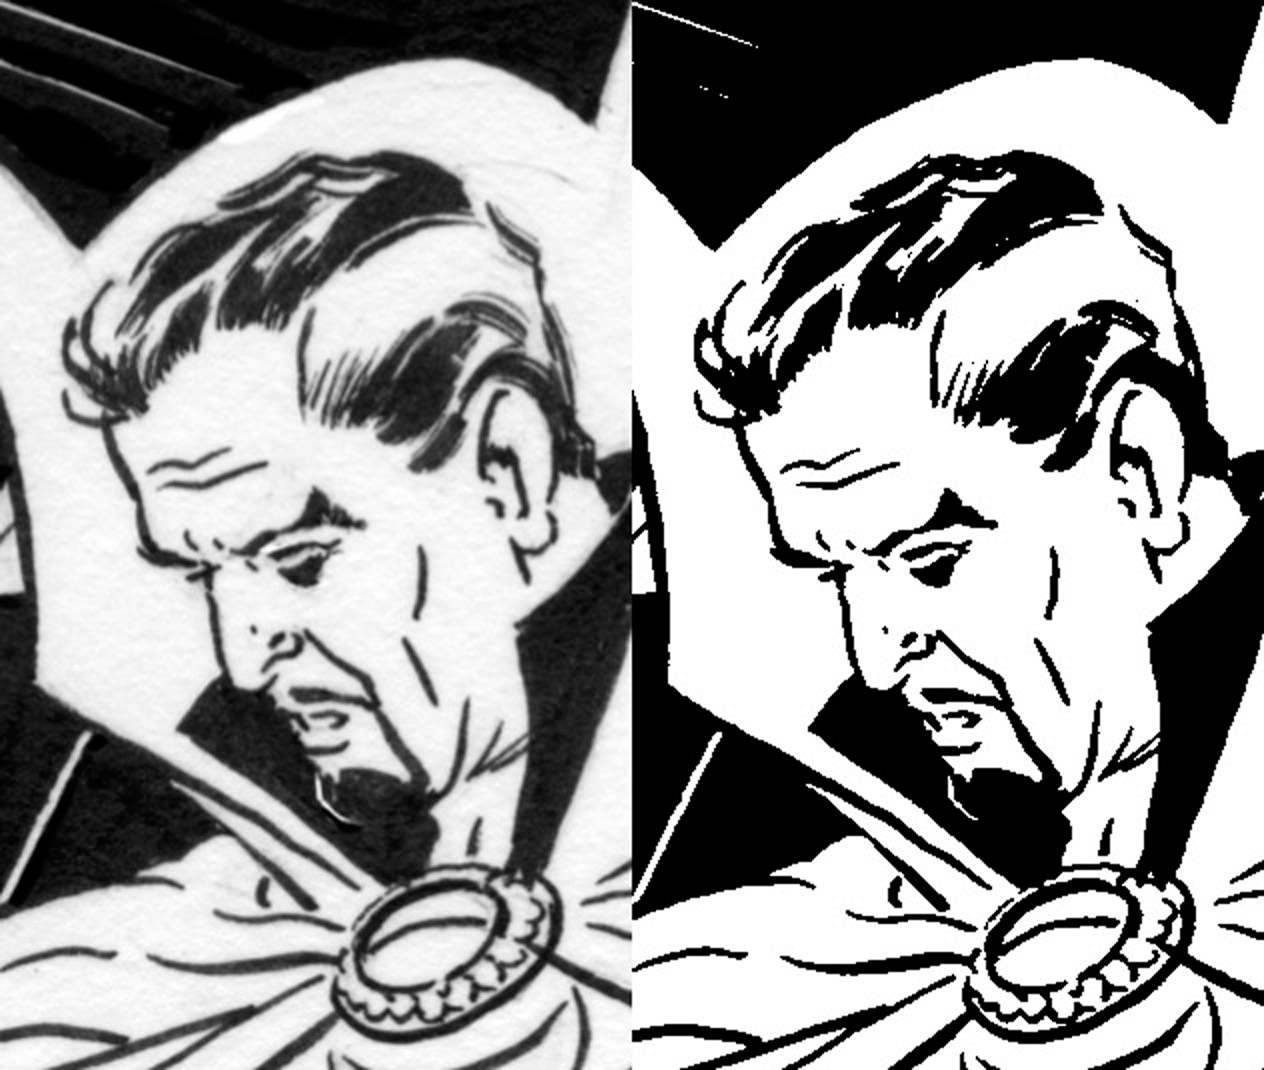 Drawn comics digitally Part scan raw zoom Coloring